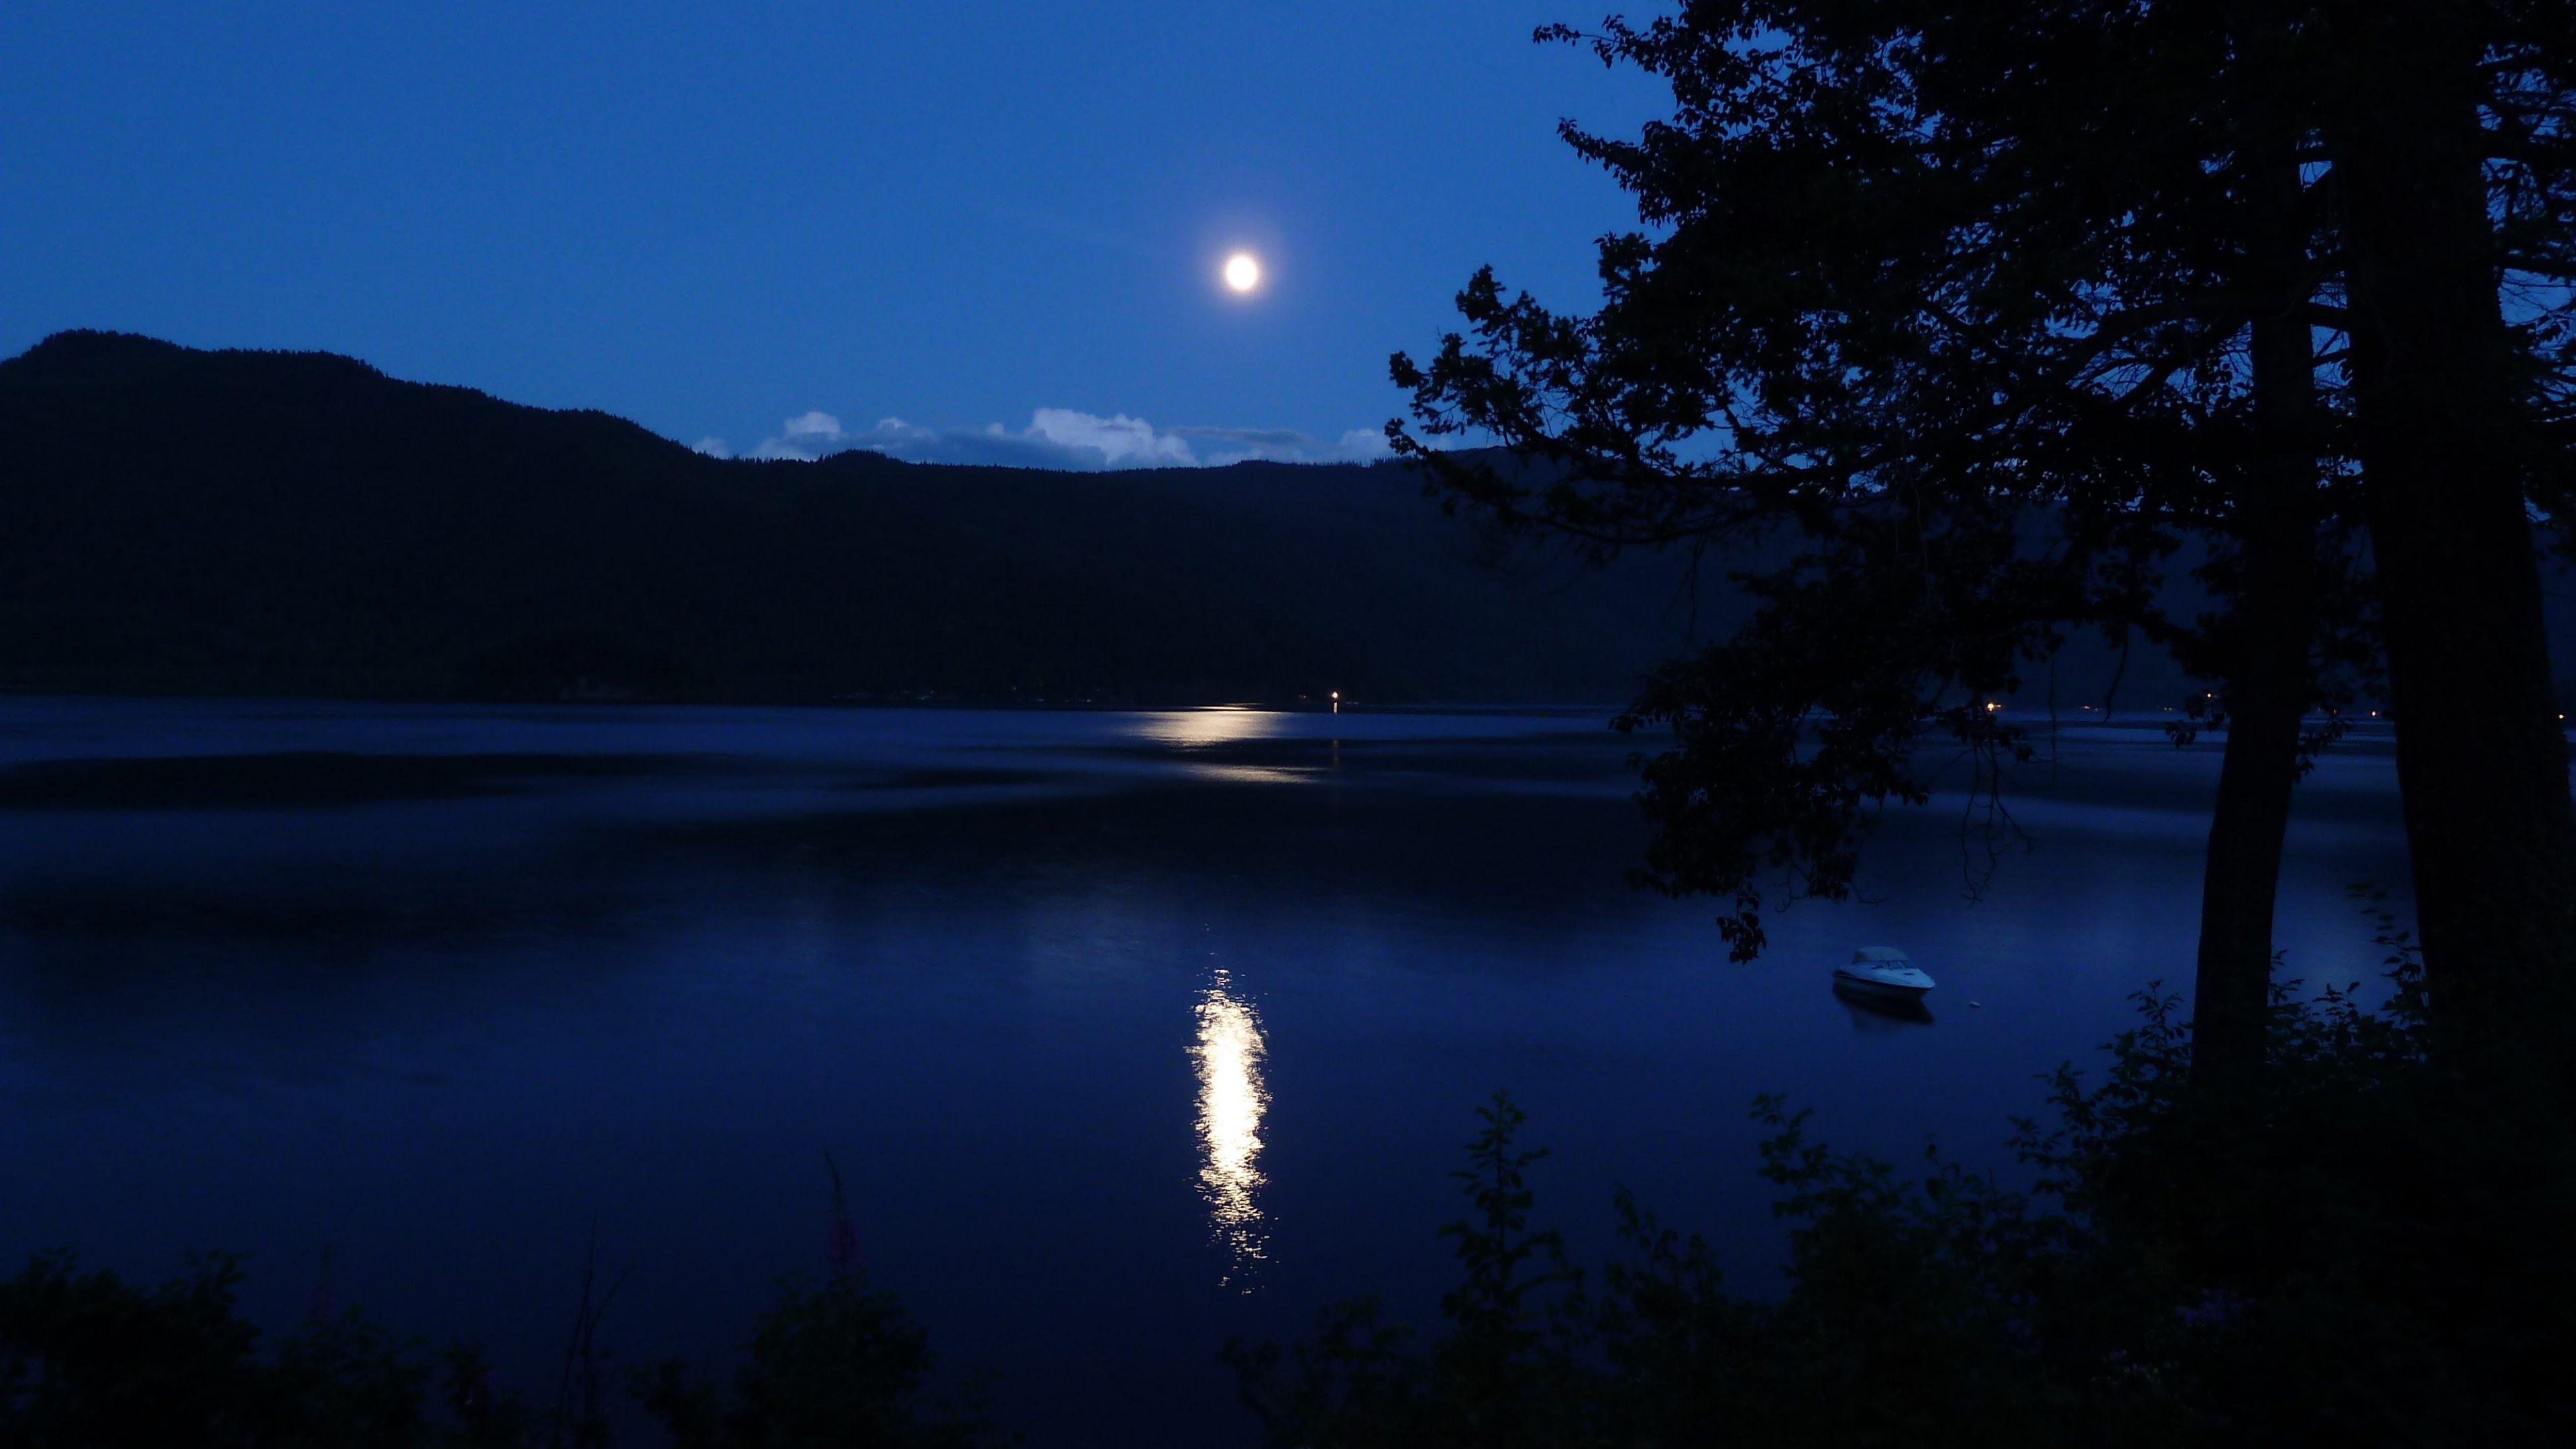 2048x2048 Lake Ultra Hd 4k Ipad Air Hd 4k Wallpapers: Full Moon Over A Lake 5K UHD Wallpaper